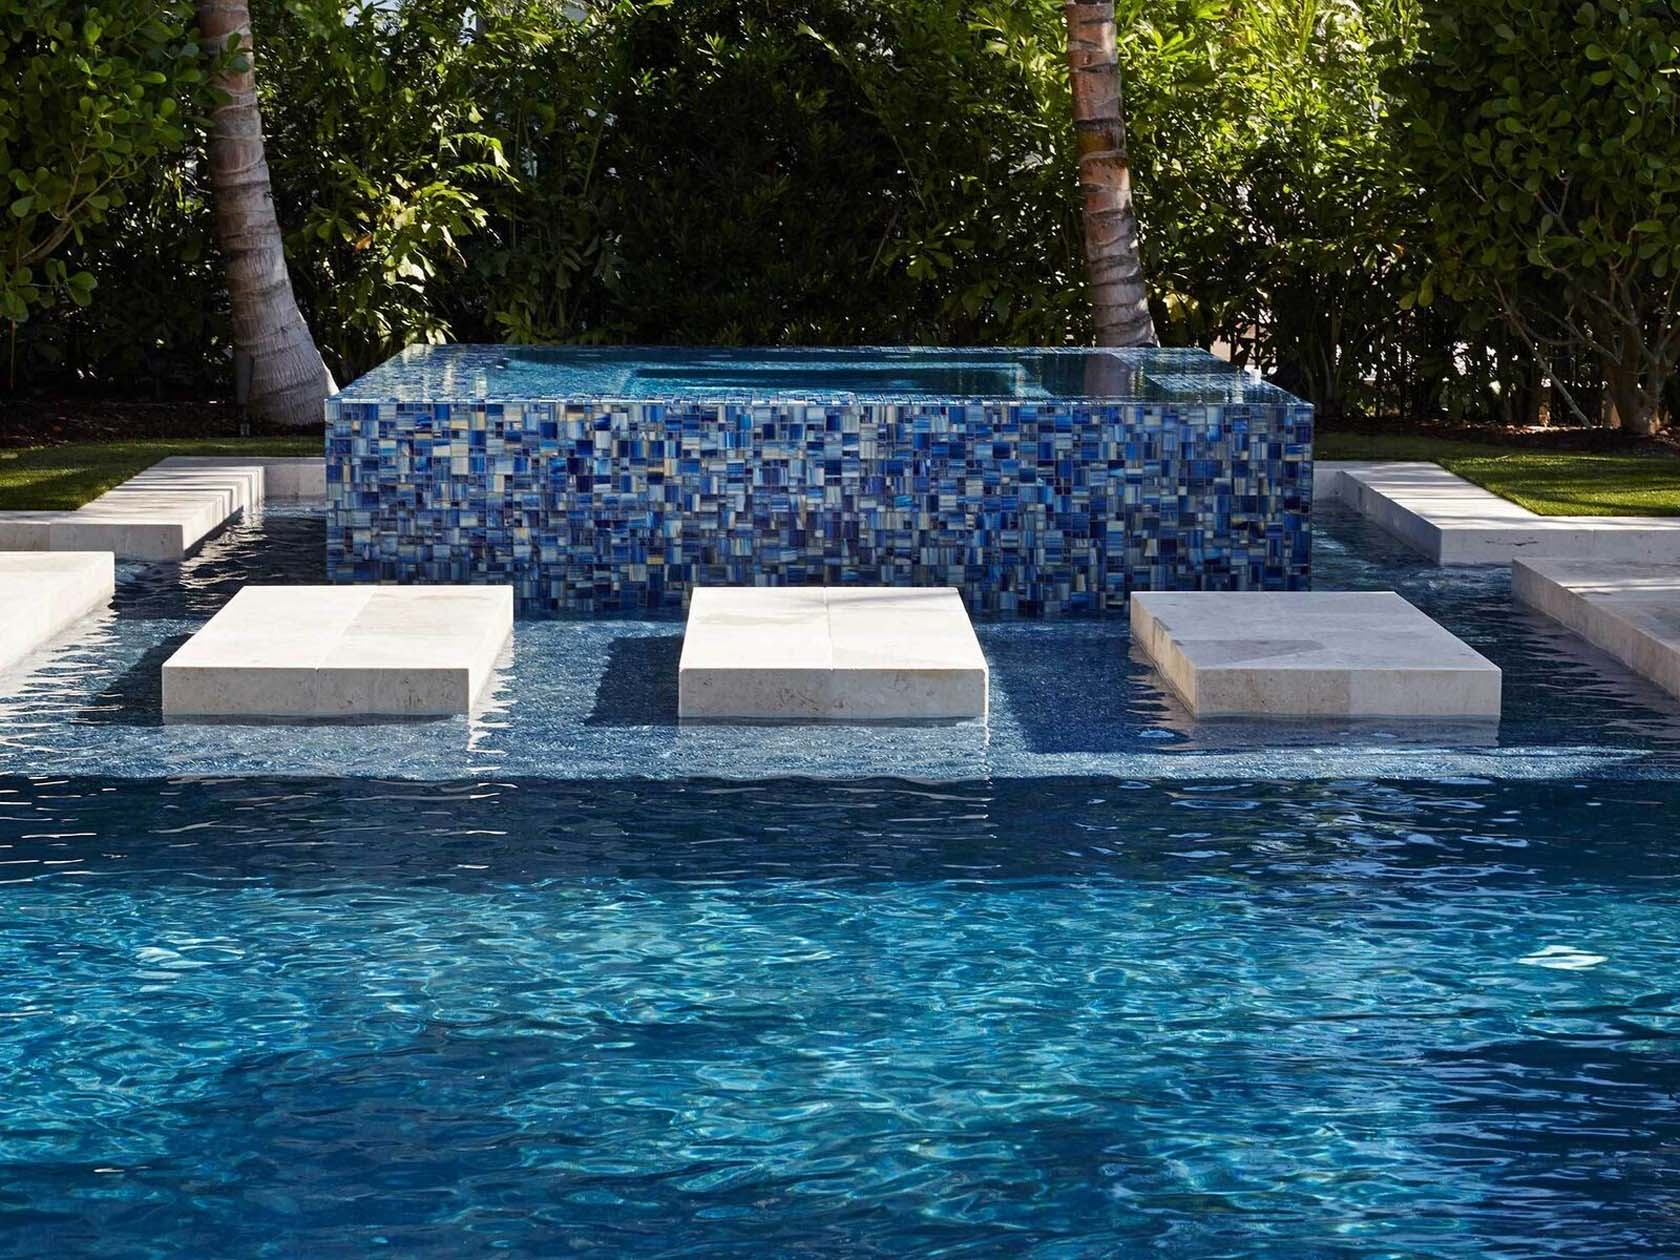 pool plaster vs pool tiles which is